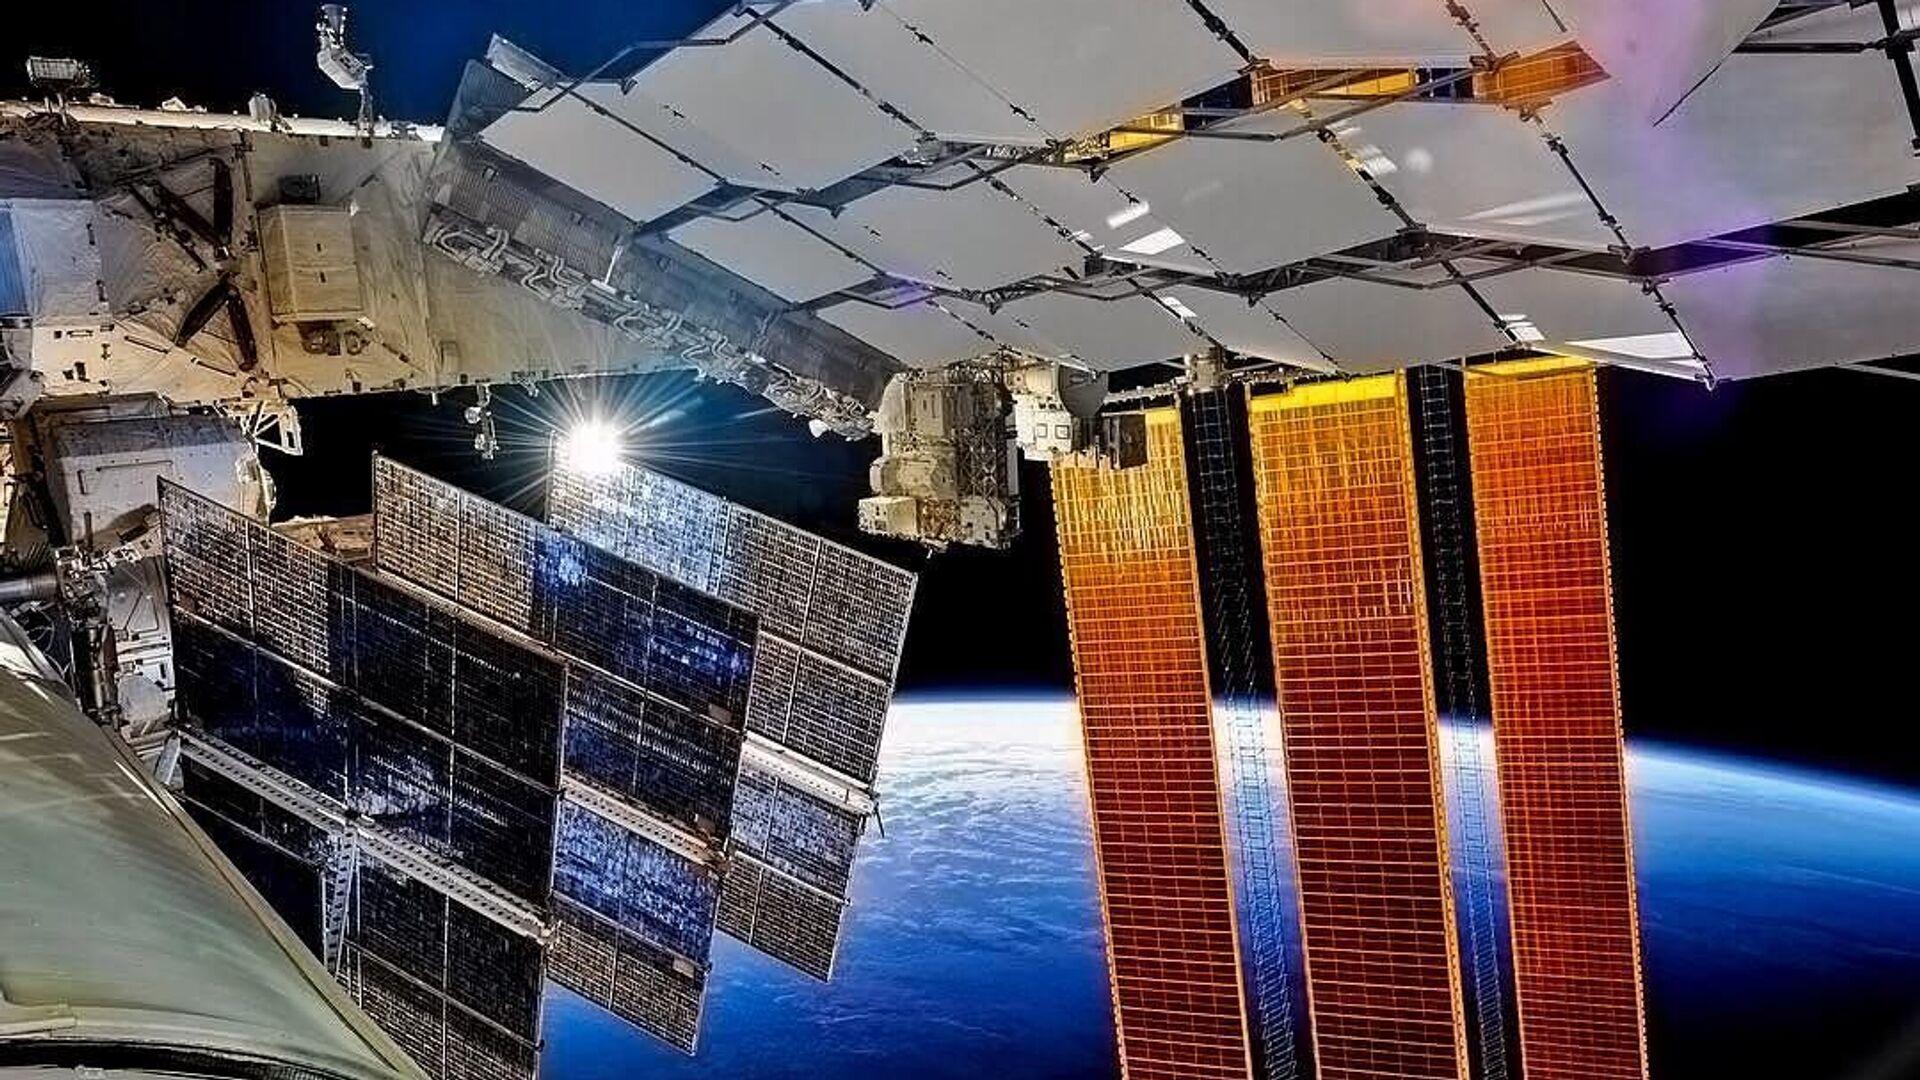 Stazione Spaziale Internazionale - Sputnik Italia, 1920, 09.09.2021